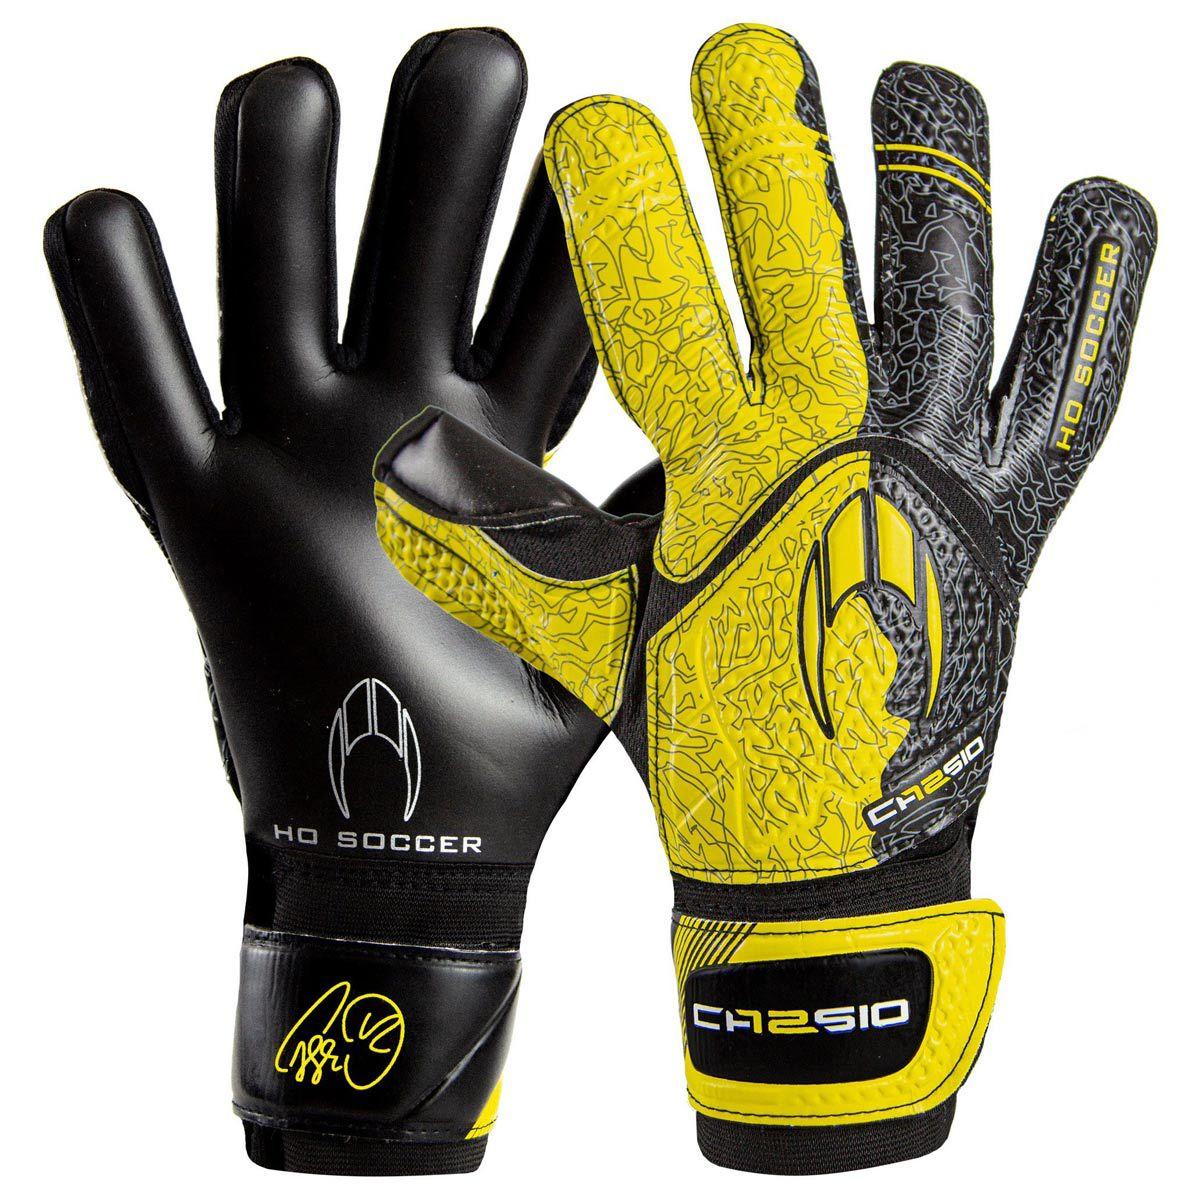 Luva HO Soccer Cassio Training Yellow 9976